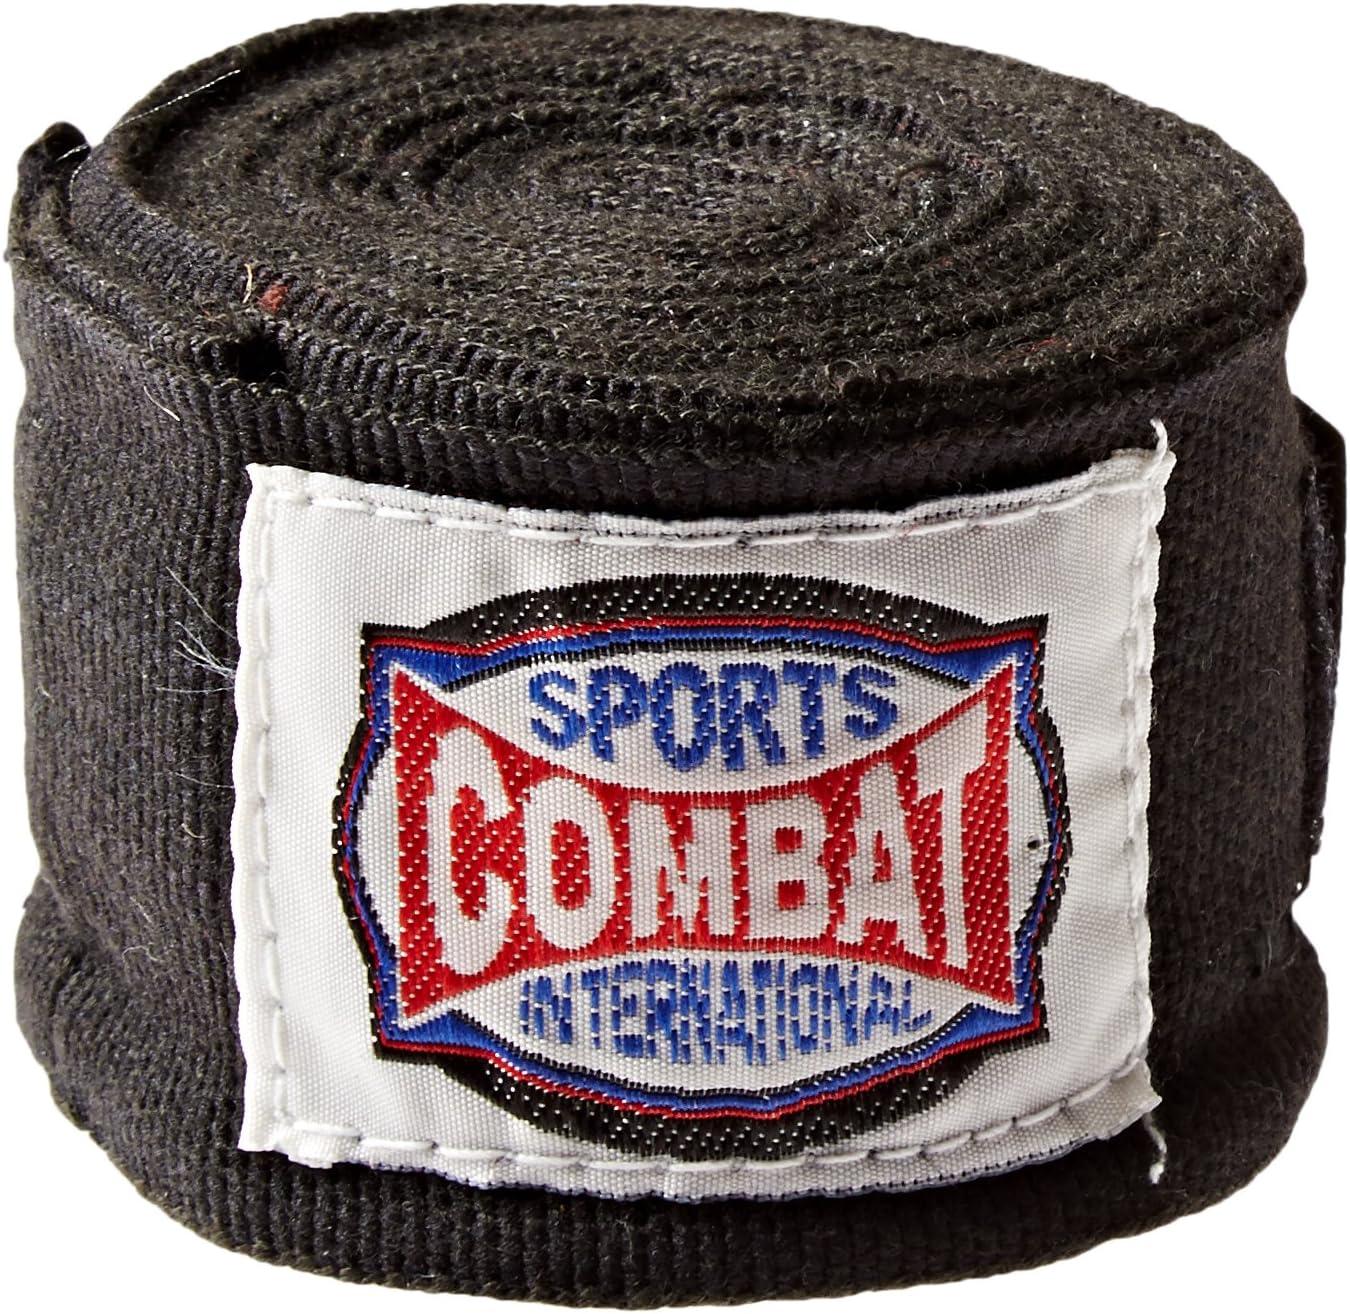 Very popular Combat Sports 2021 new Semi-Elastic 10 Pack Handwraps